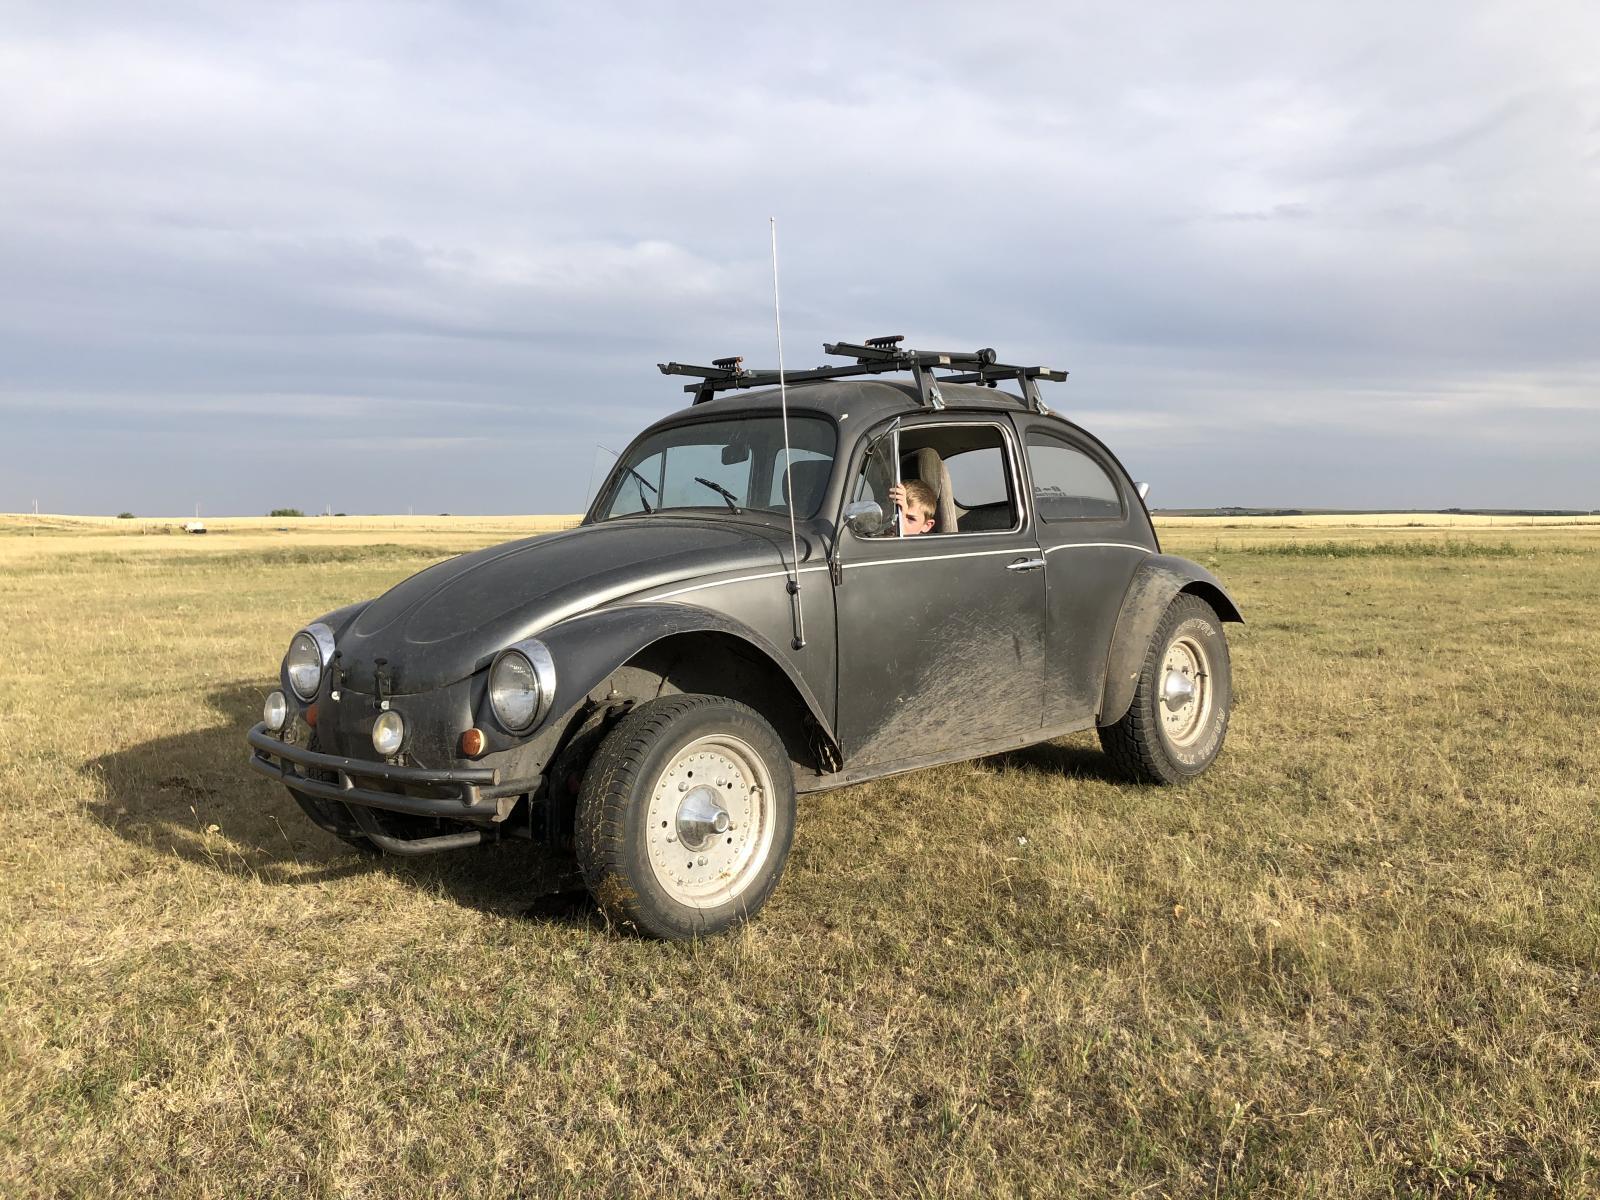 My 60 Baja